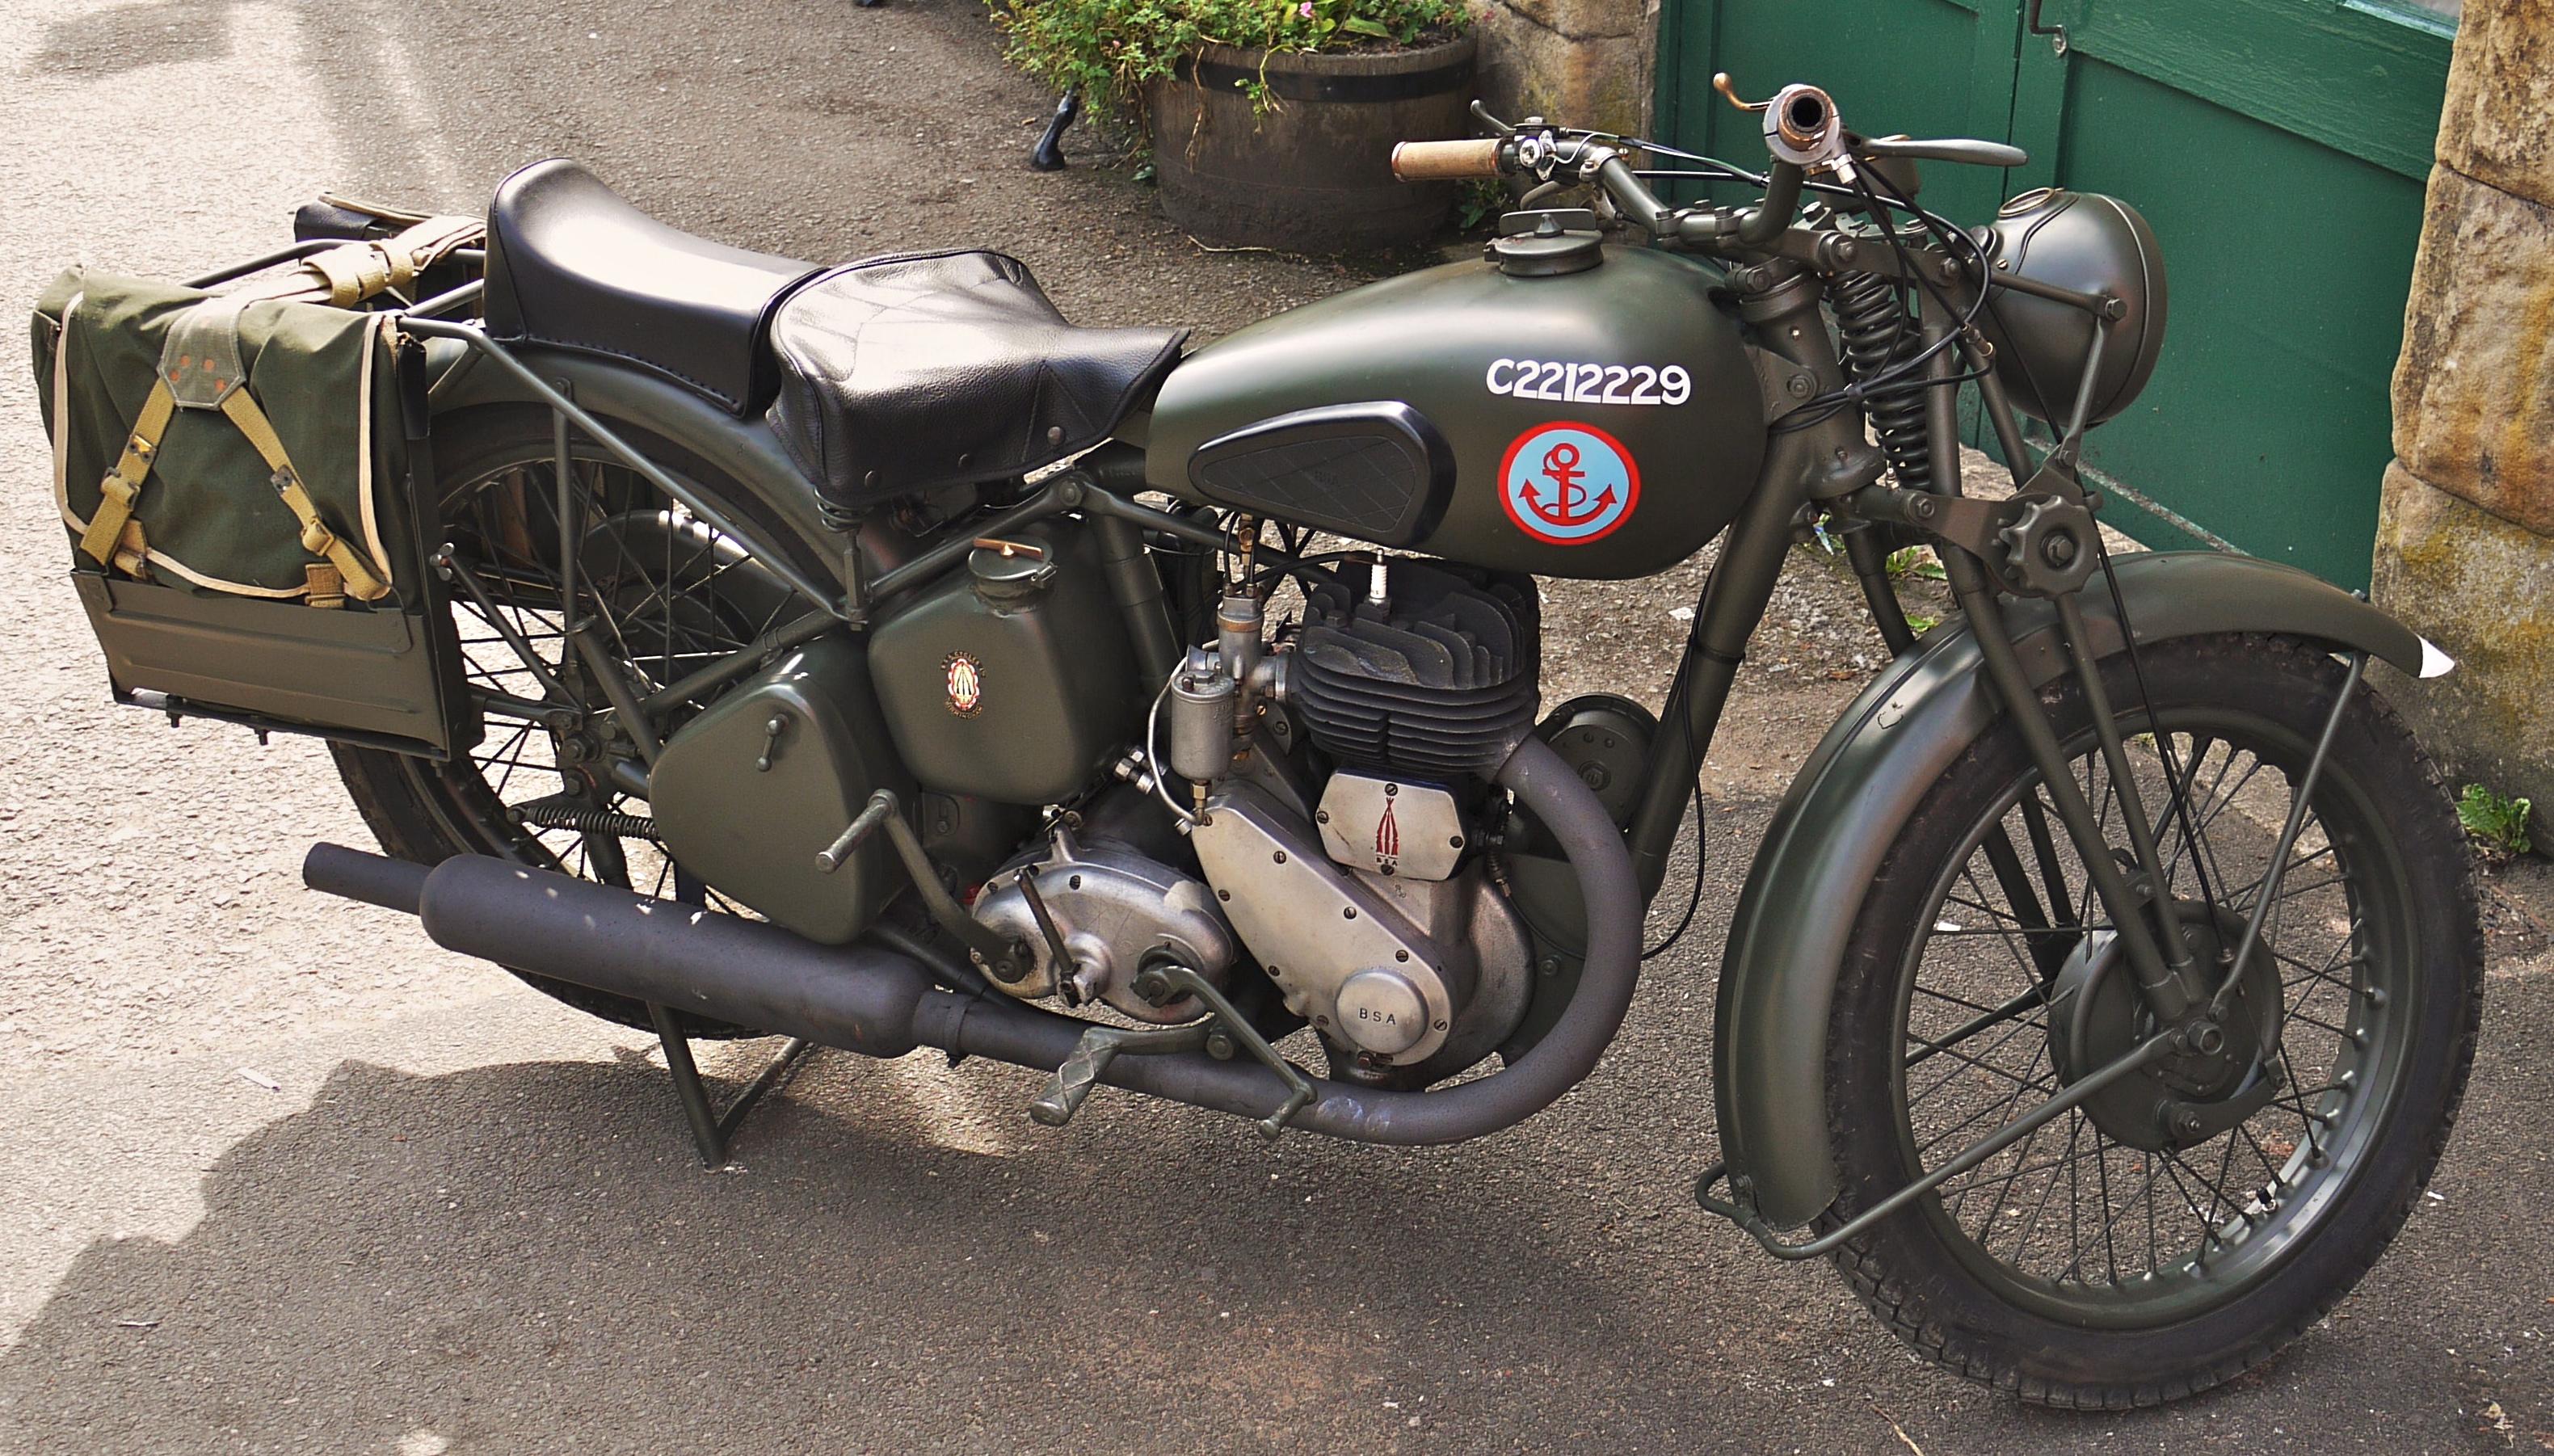 FileBSA Army Motorcycle   Flickr   mick   Lumixjpg 3161x1802